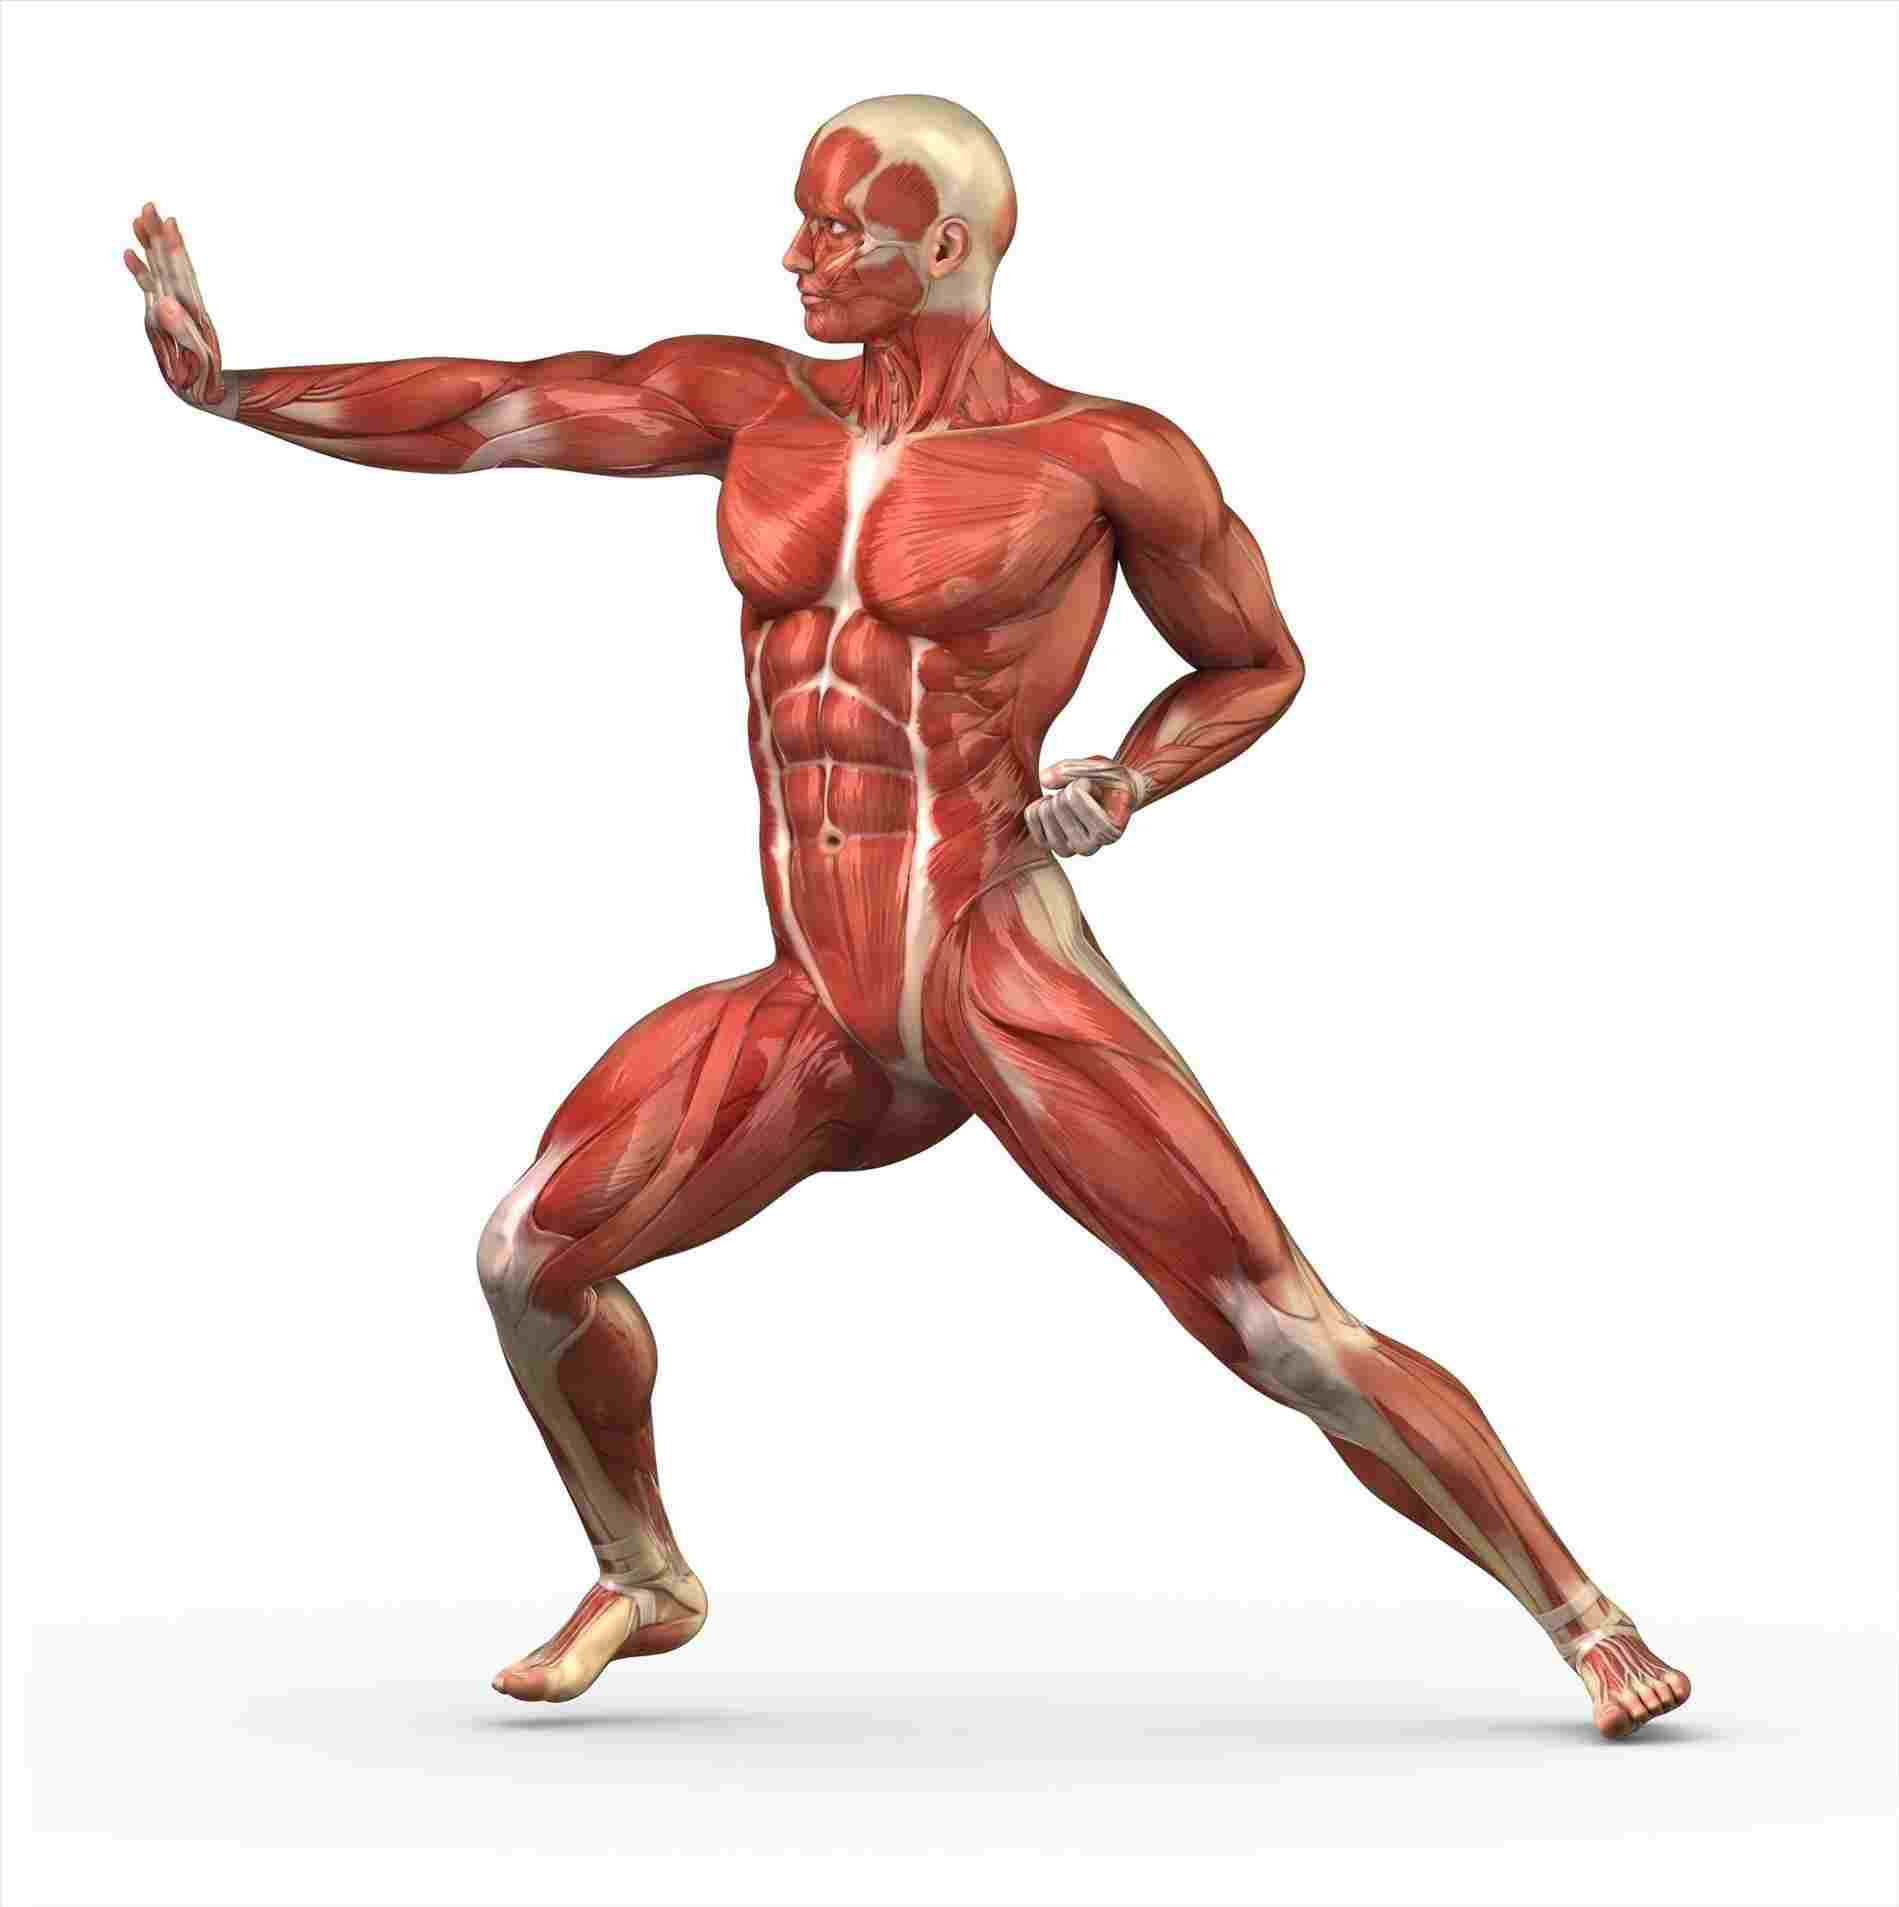 1899x1907 Human Body Muscles Drawing